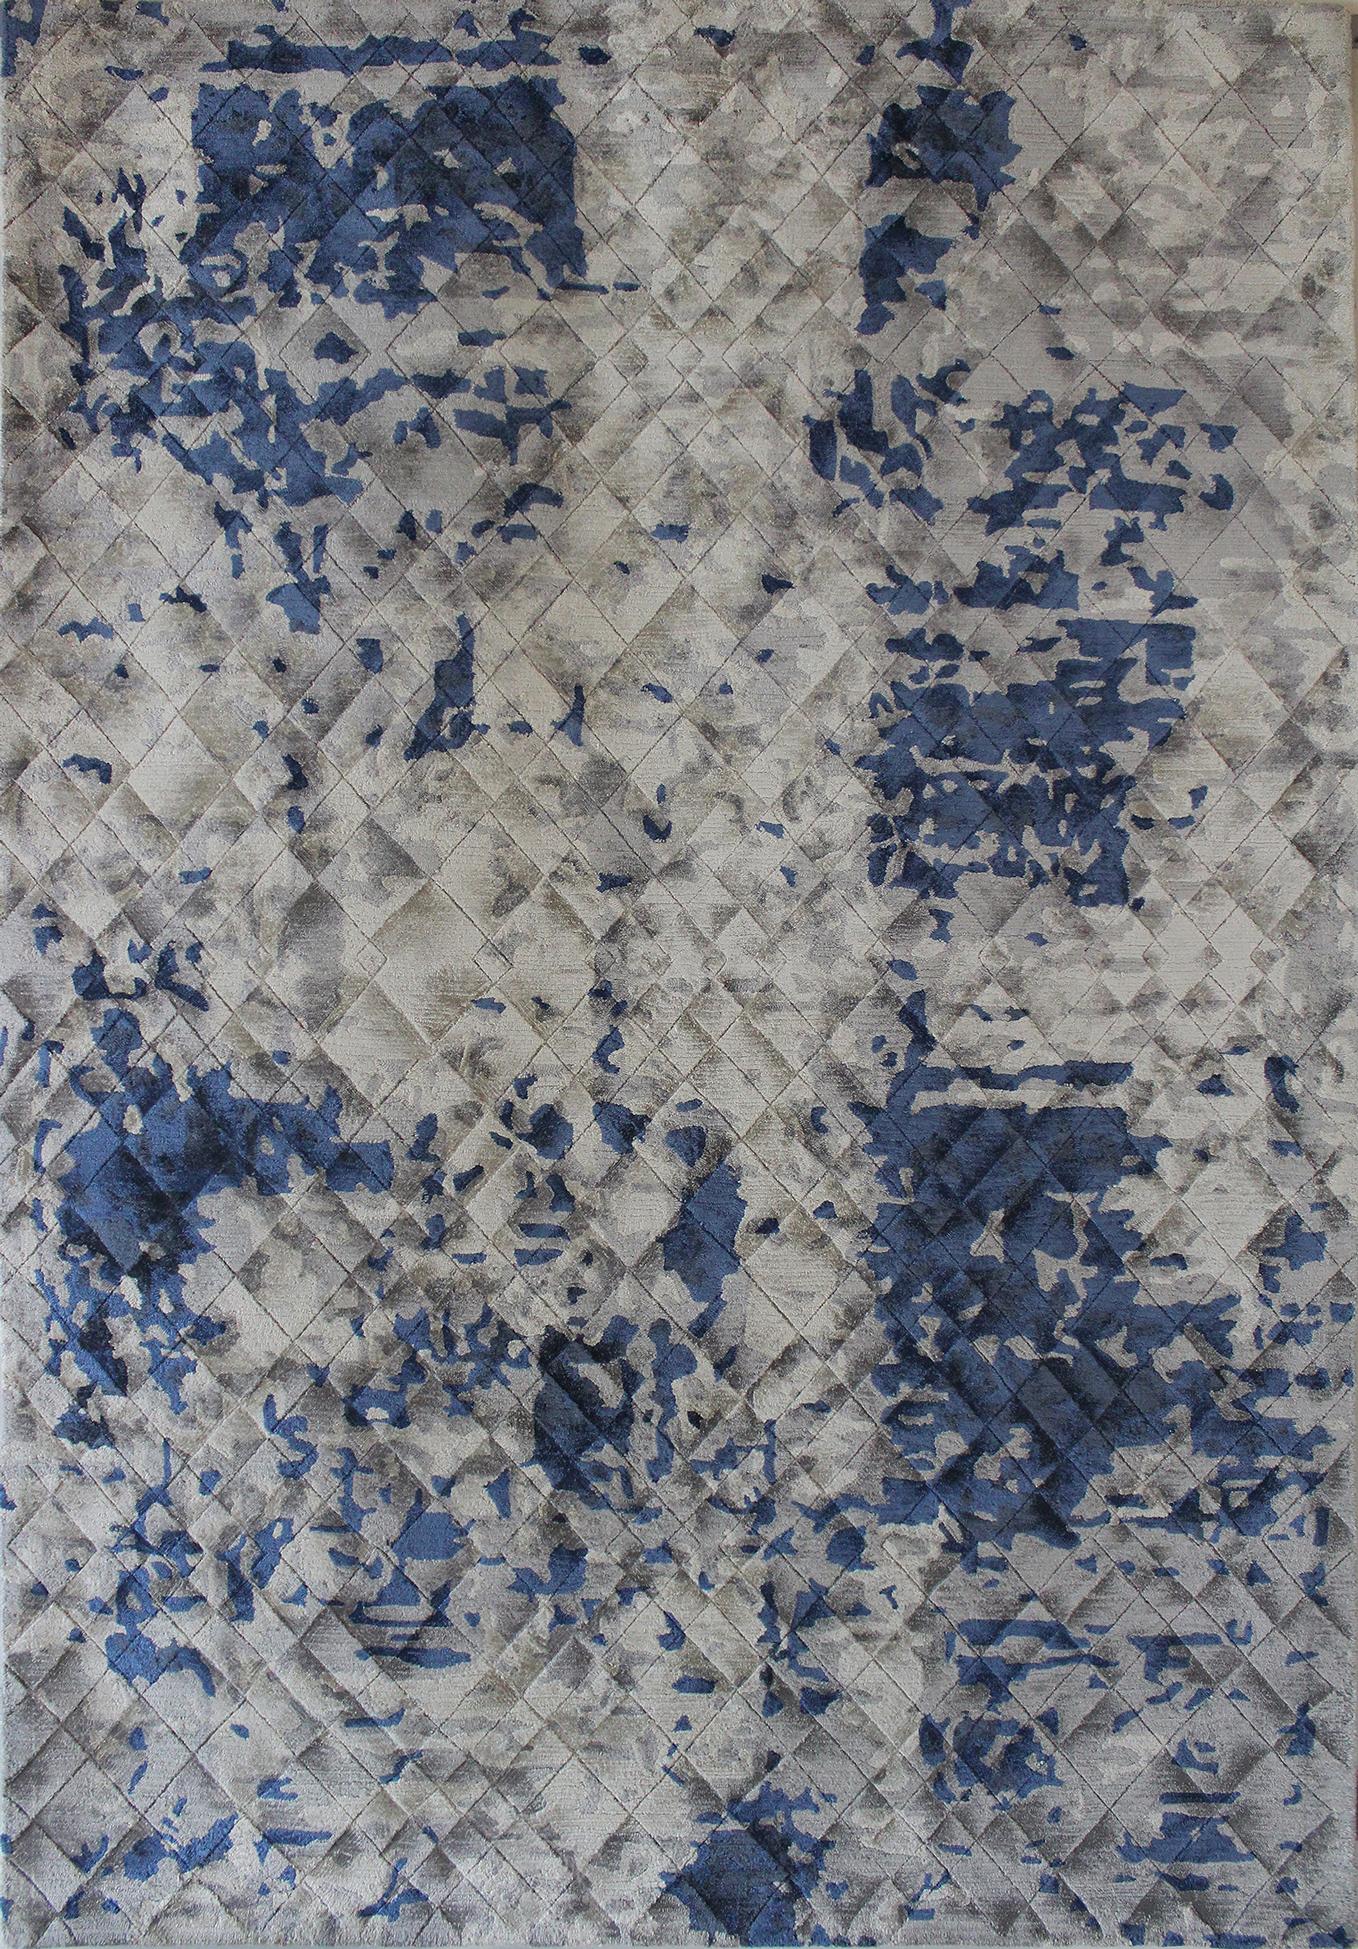 Mesa Beige Blue Carpets & Rugs